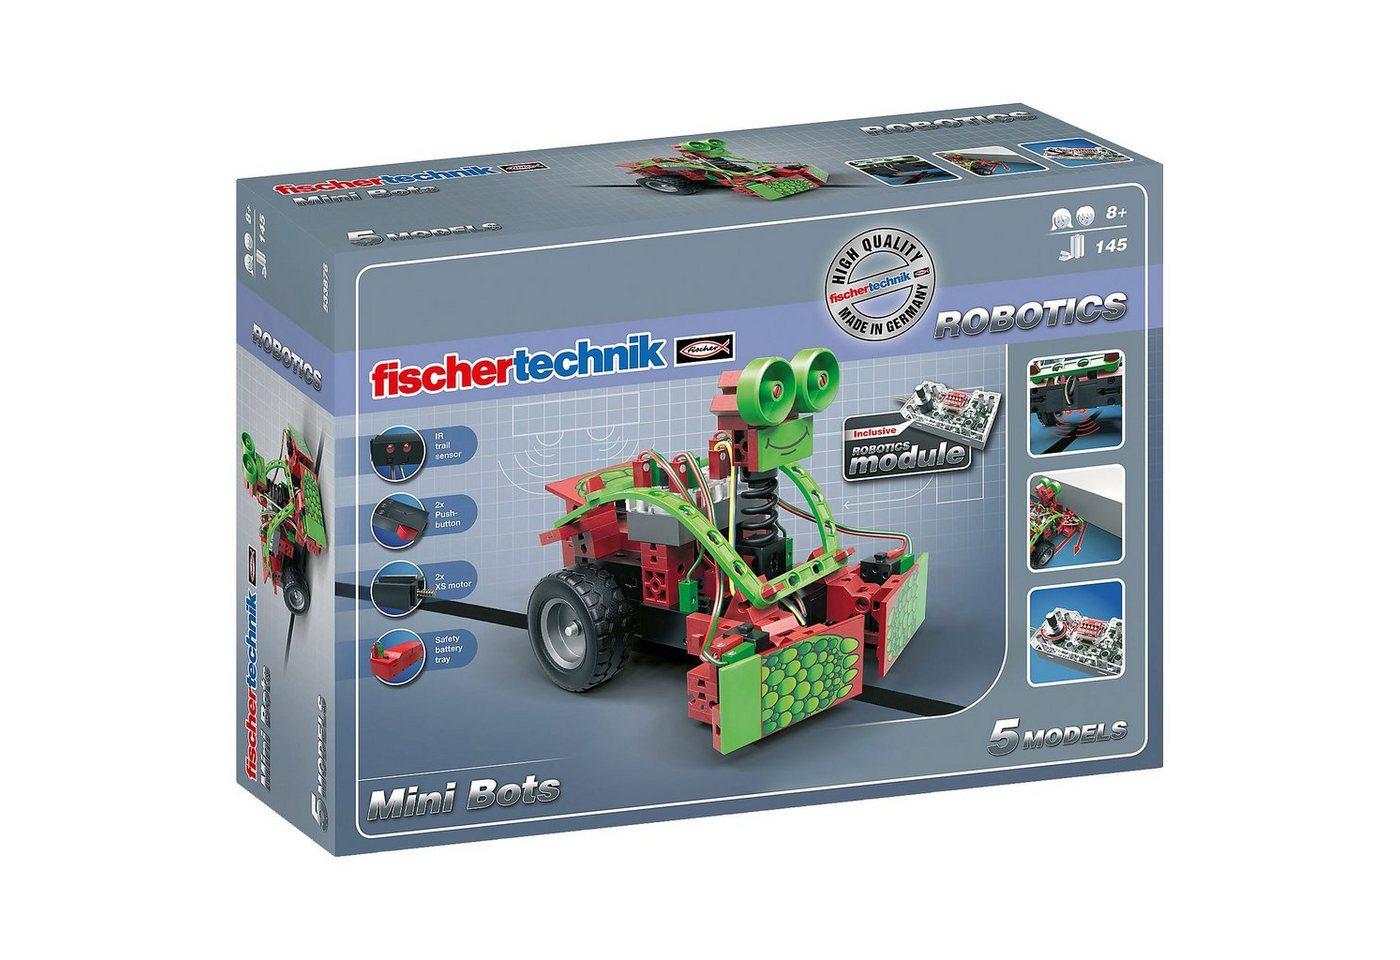 fischertechnik ROBOTICS - Mini Bots